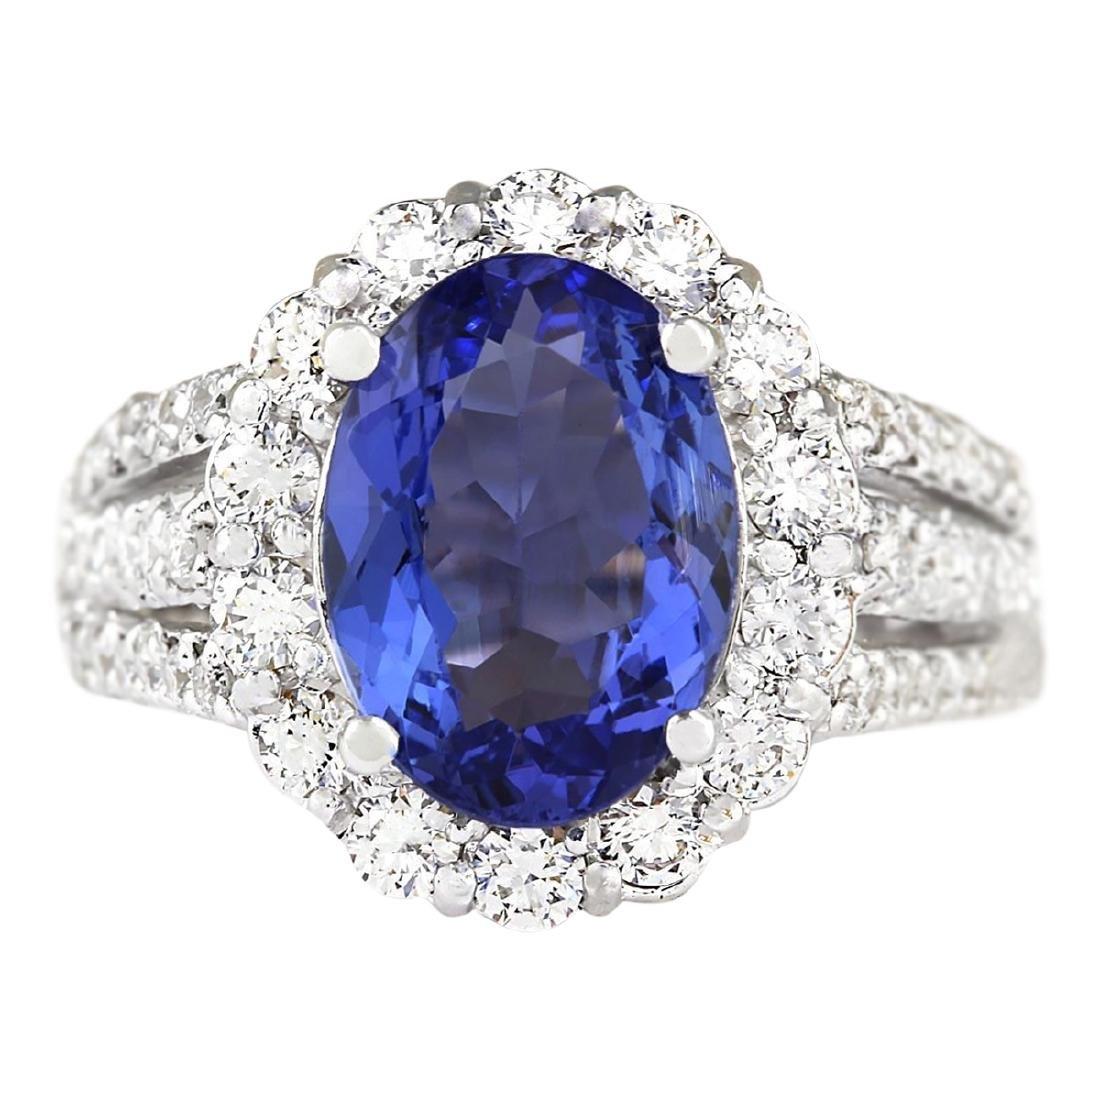 5.42 CTW Natural Blue Tanzanite And Diamond Ring 18K